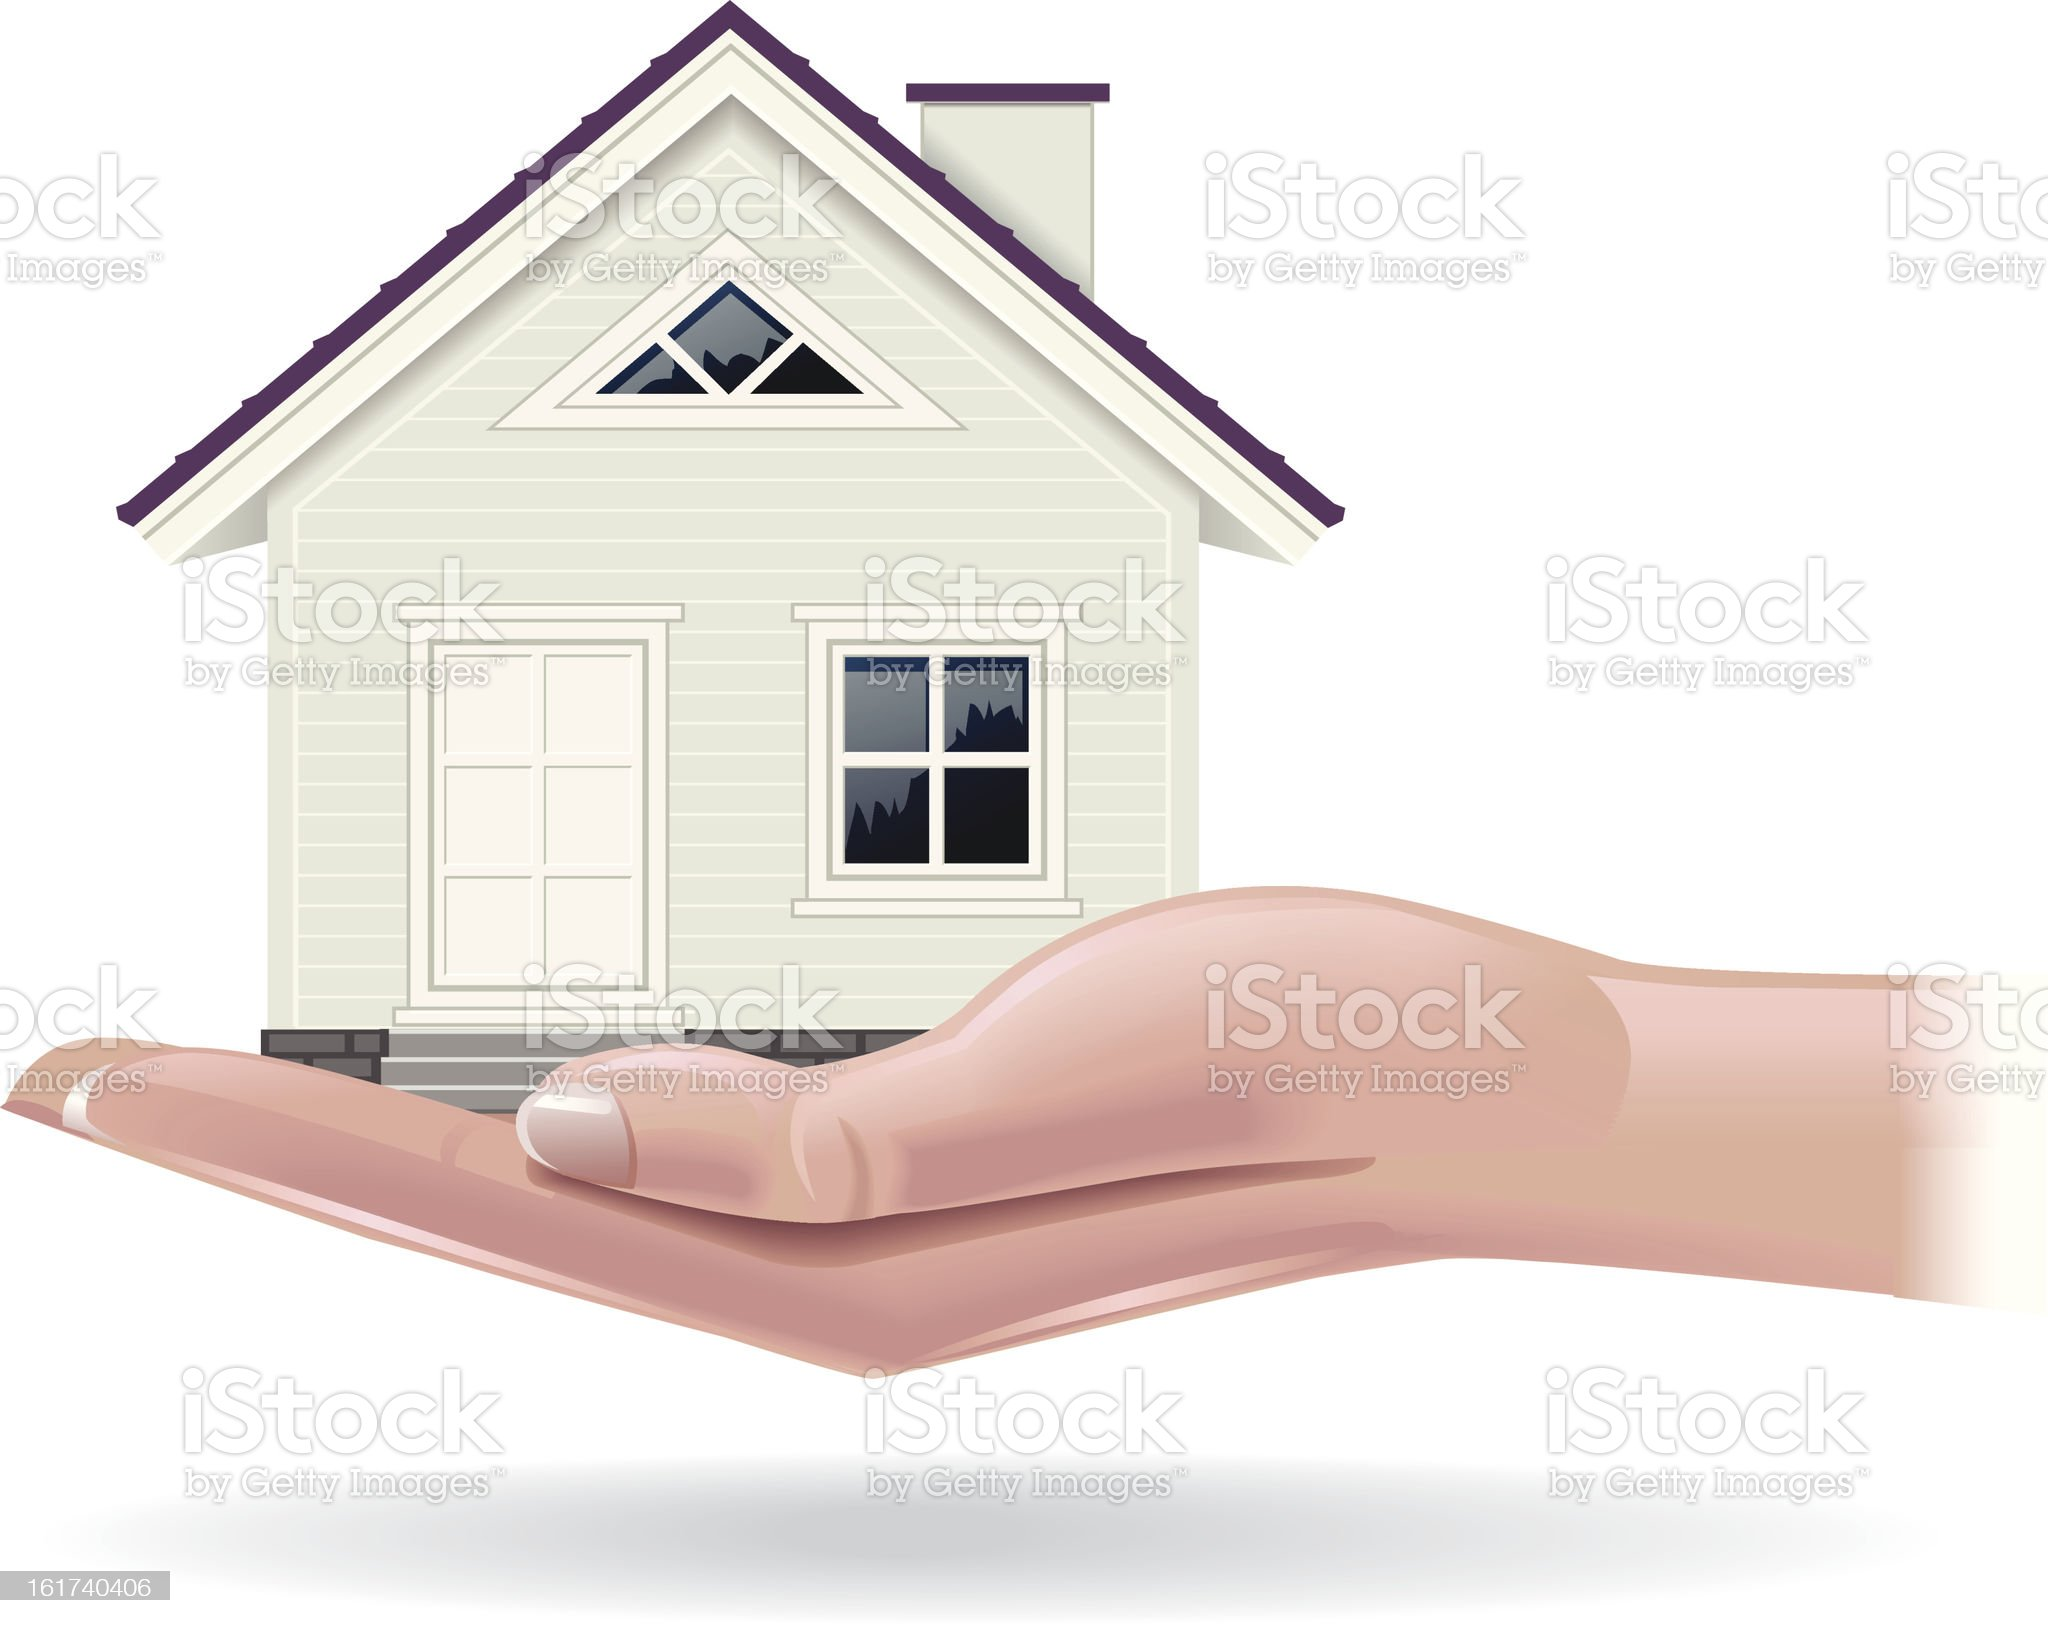 Real estate royalty-free stock vector art